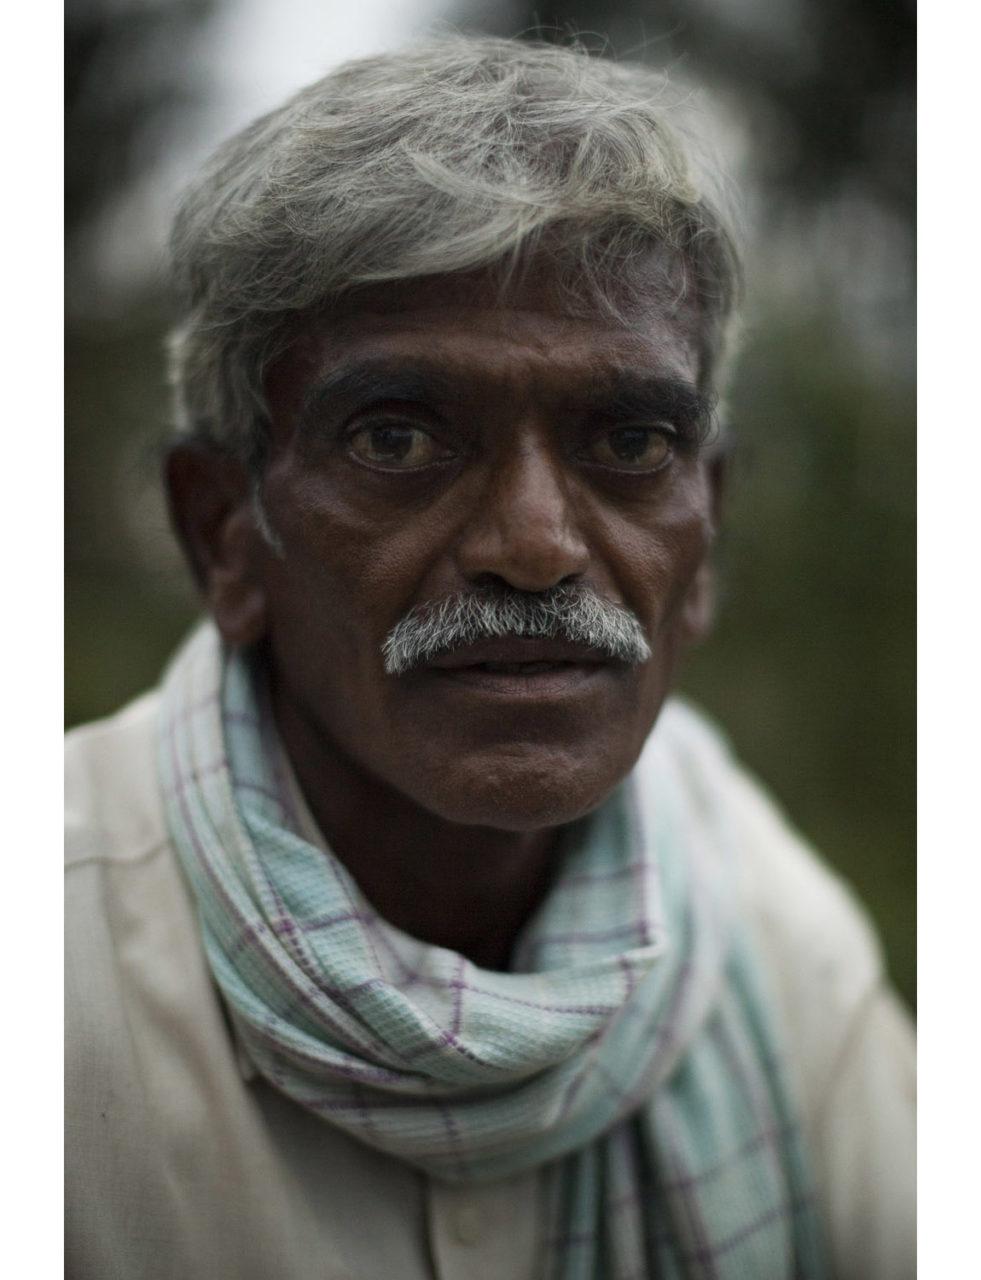 S.B Hanumantha Gowda (50), a sugarcane farmer from the village of Karadakere. He has no debts.